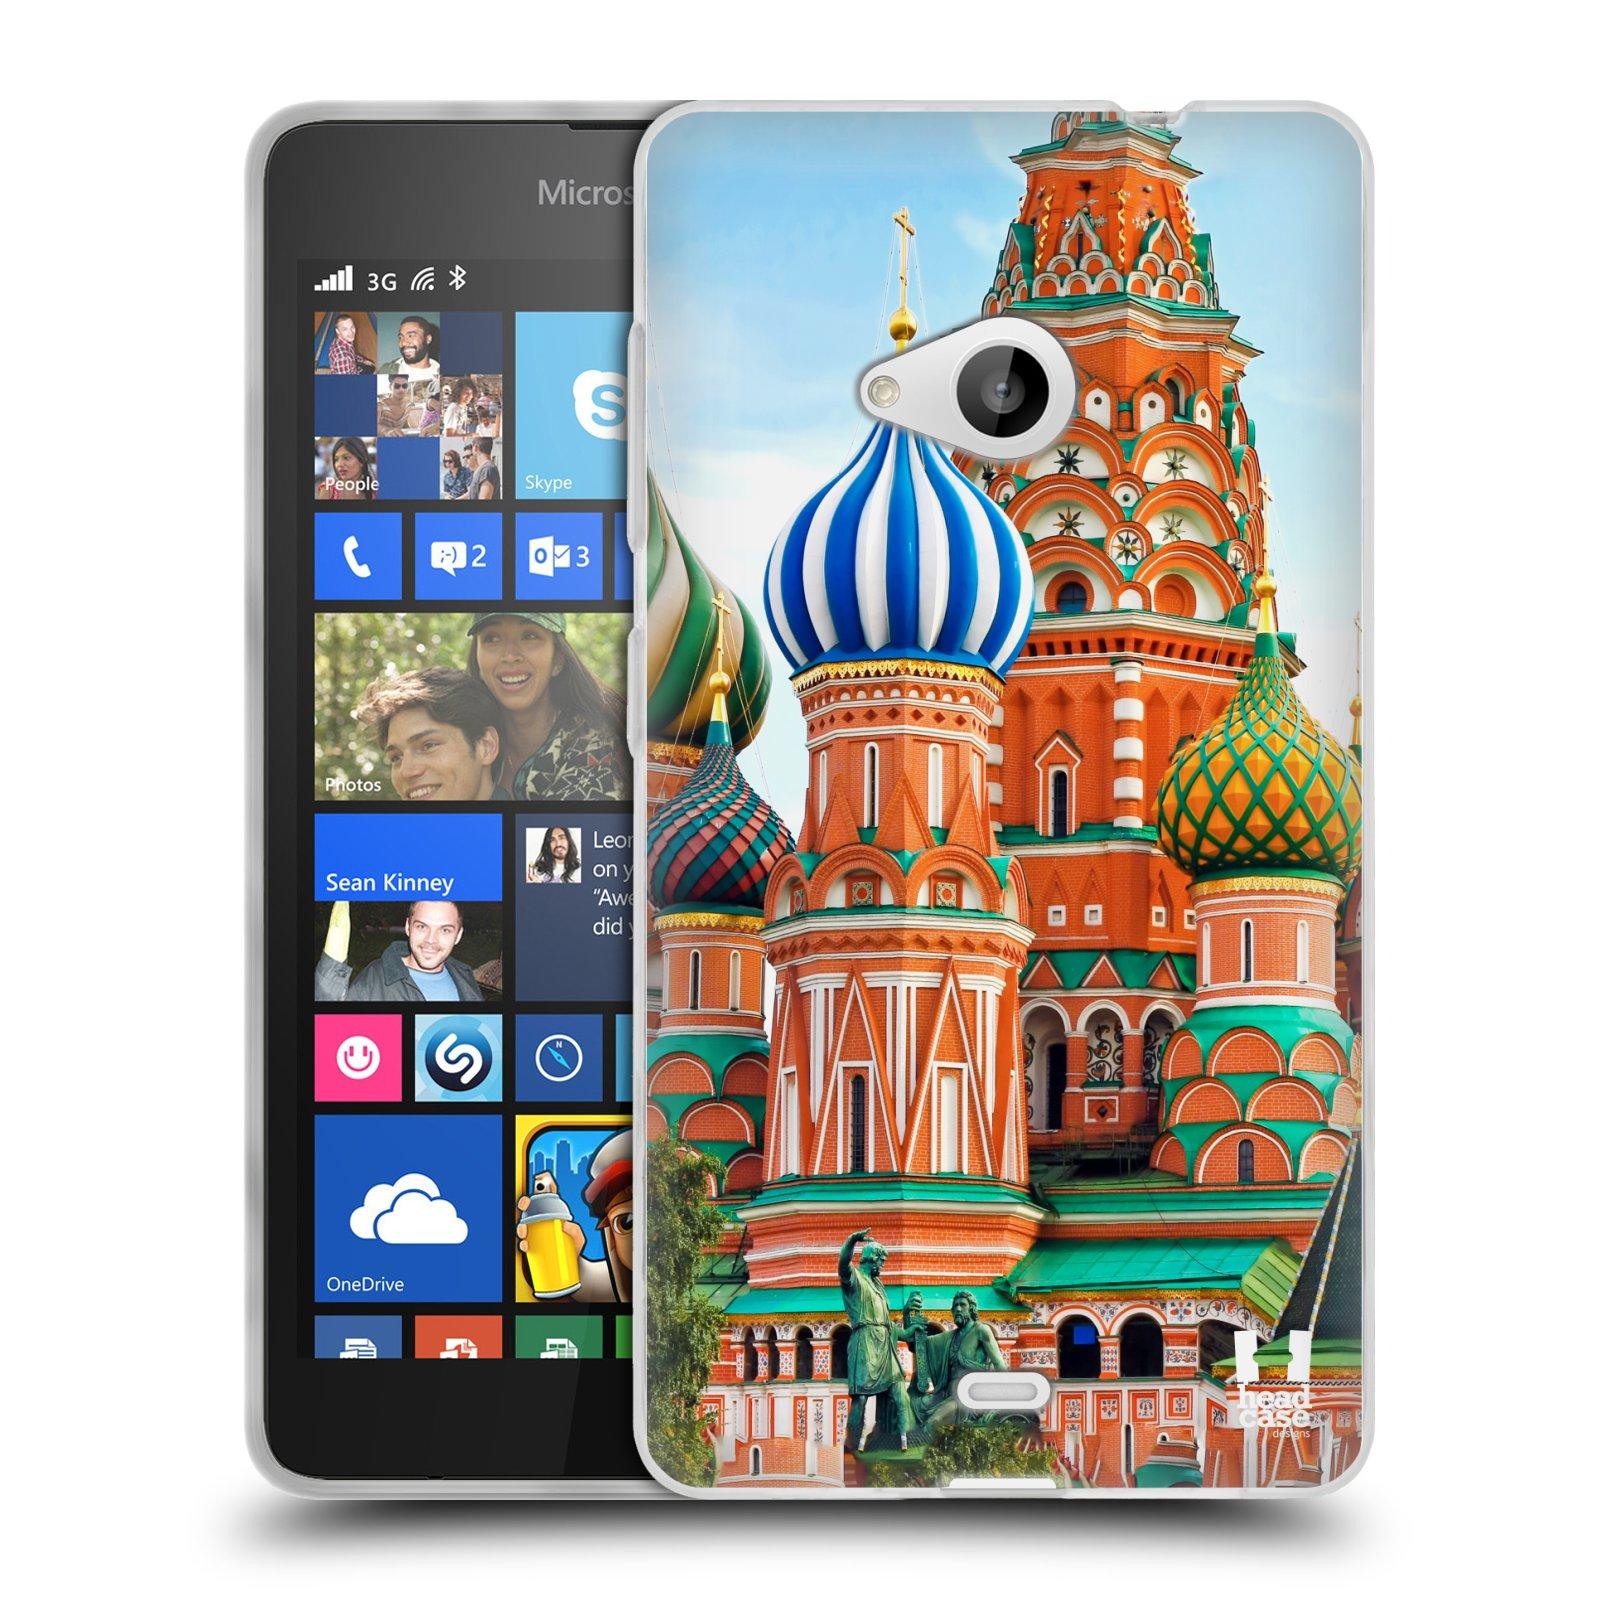 HEAD CASE silikonový obal na mobil Microsoft Lumia 535 / Lumia 535 DUAL vzor Města foto náměstí RUSKO,MOSKVA, RUDÉ NÁMĚSTÍ